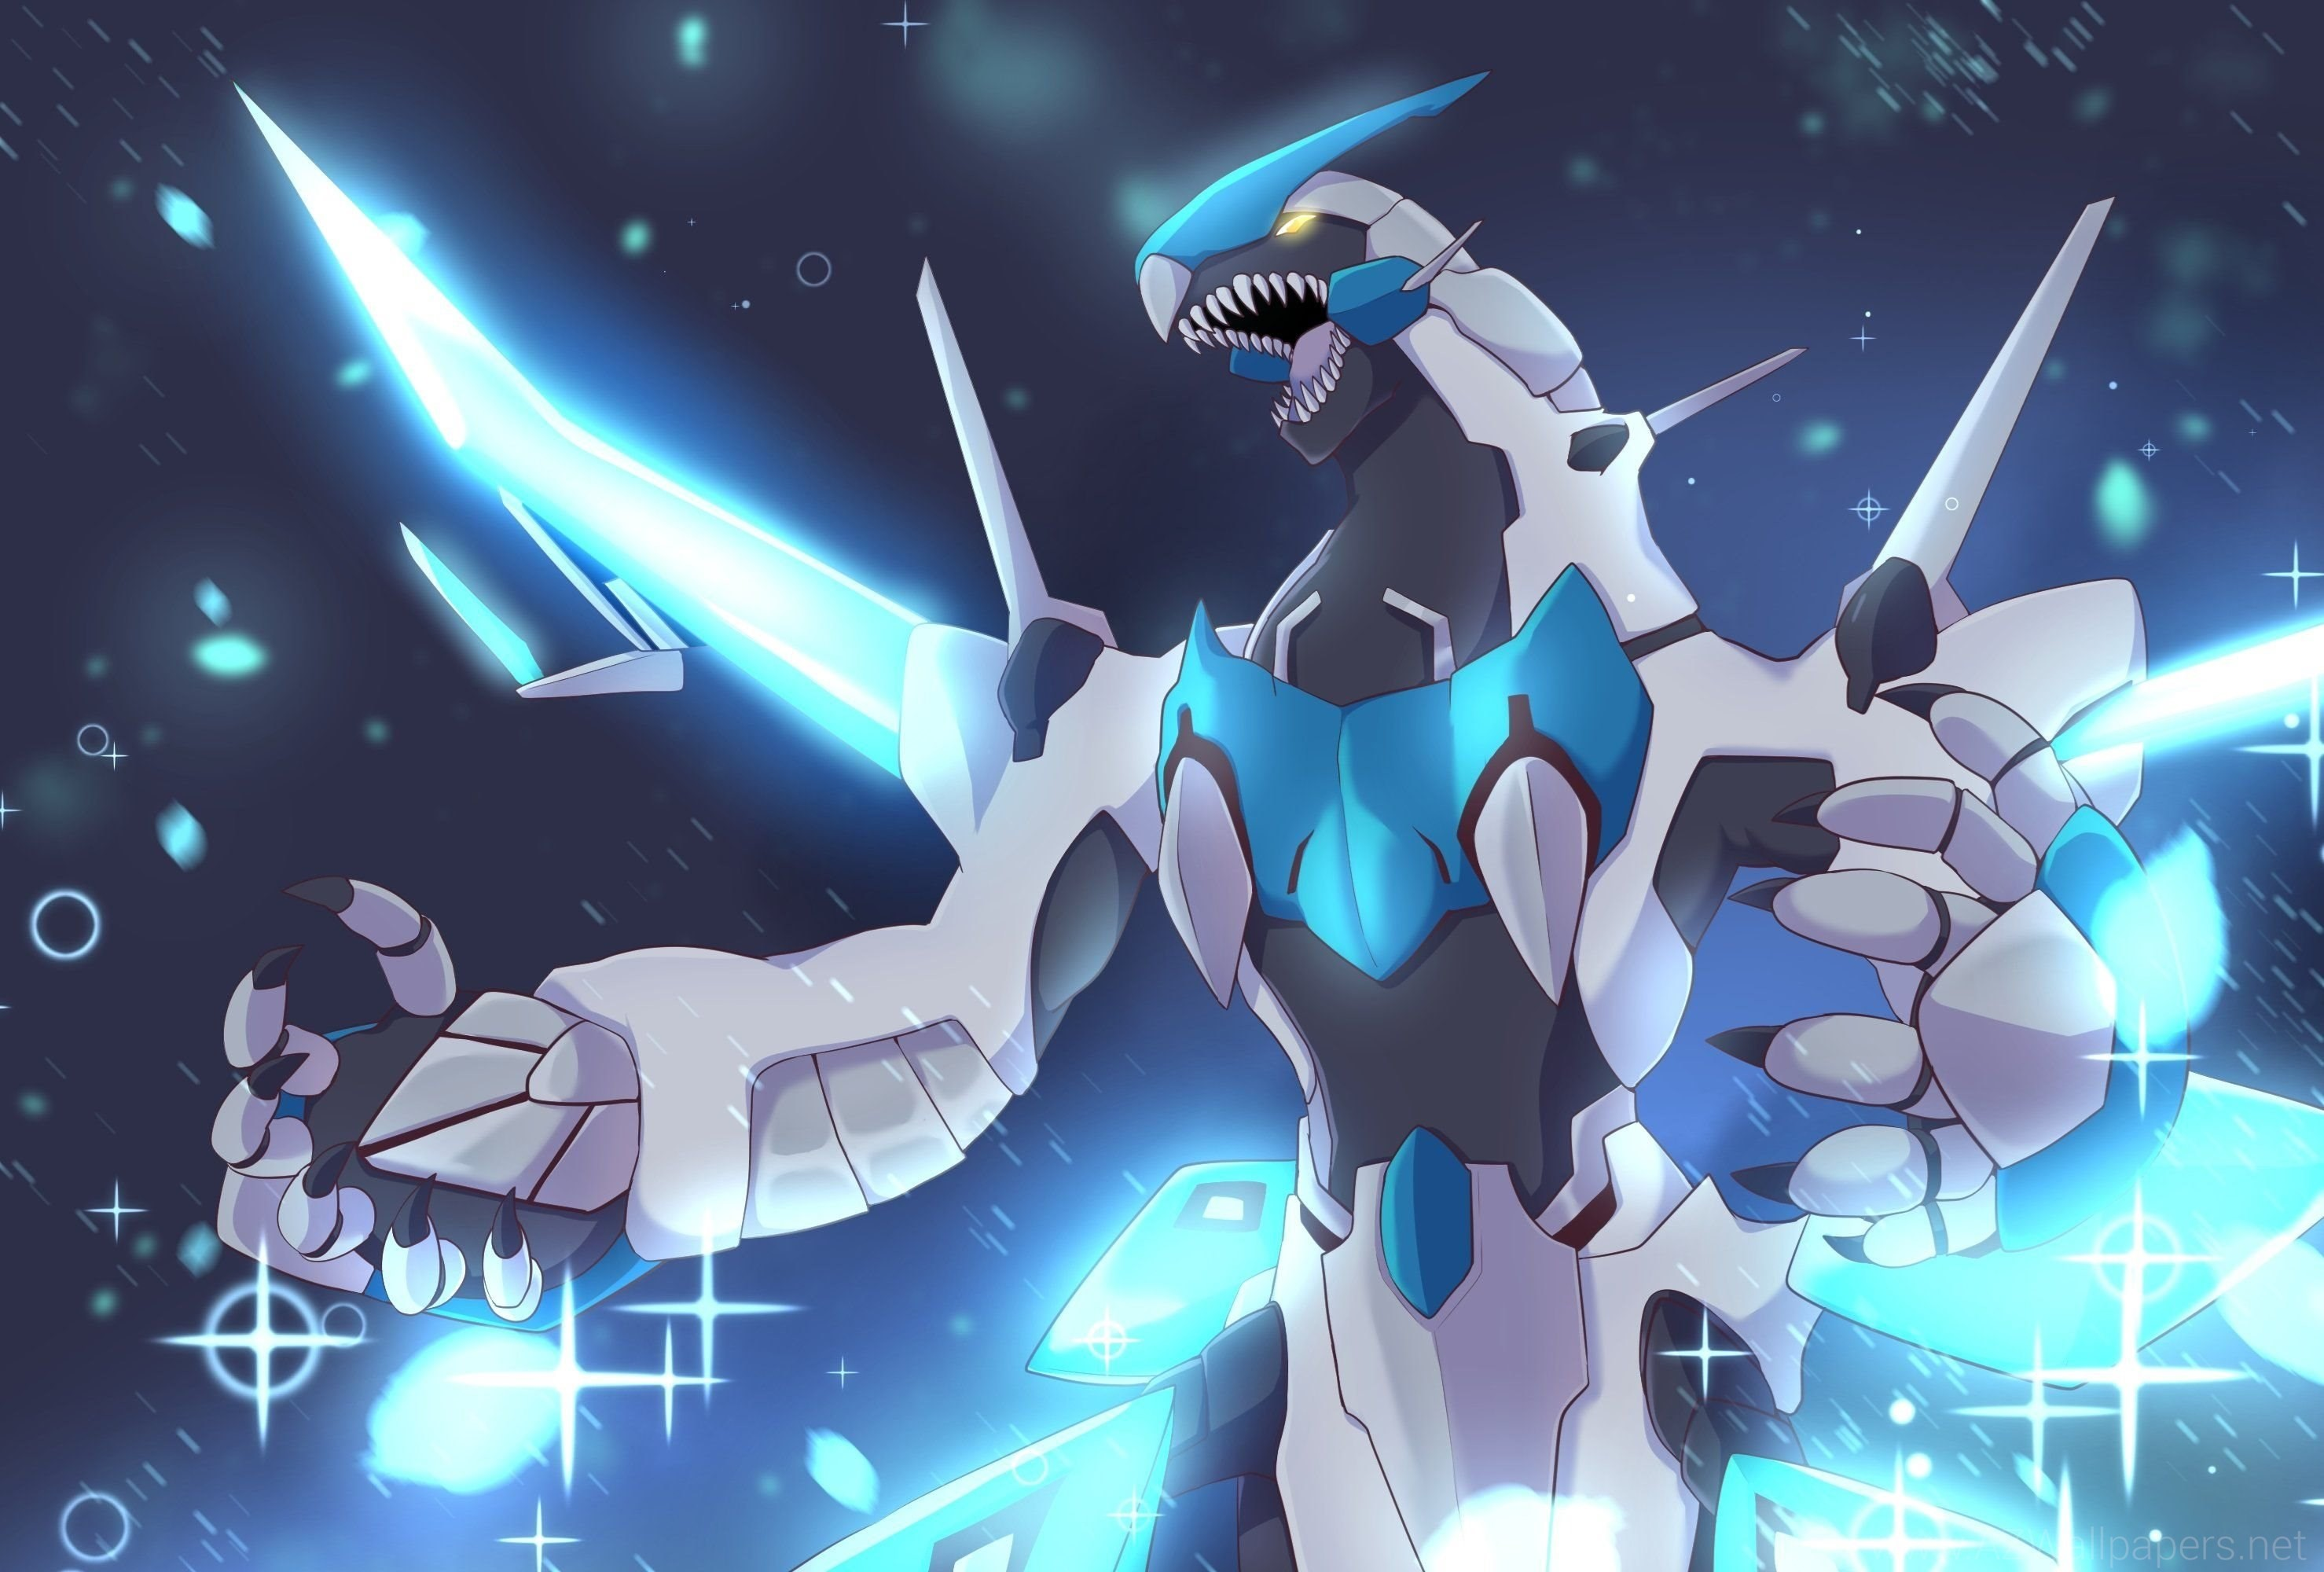 Blue Eyes White Dragon By Fairlyoddkahnefan On DeviantArt. Yu gi oh  Wallpapers